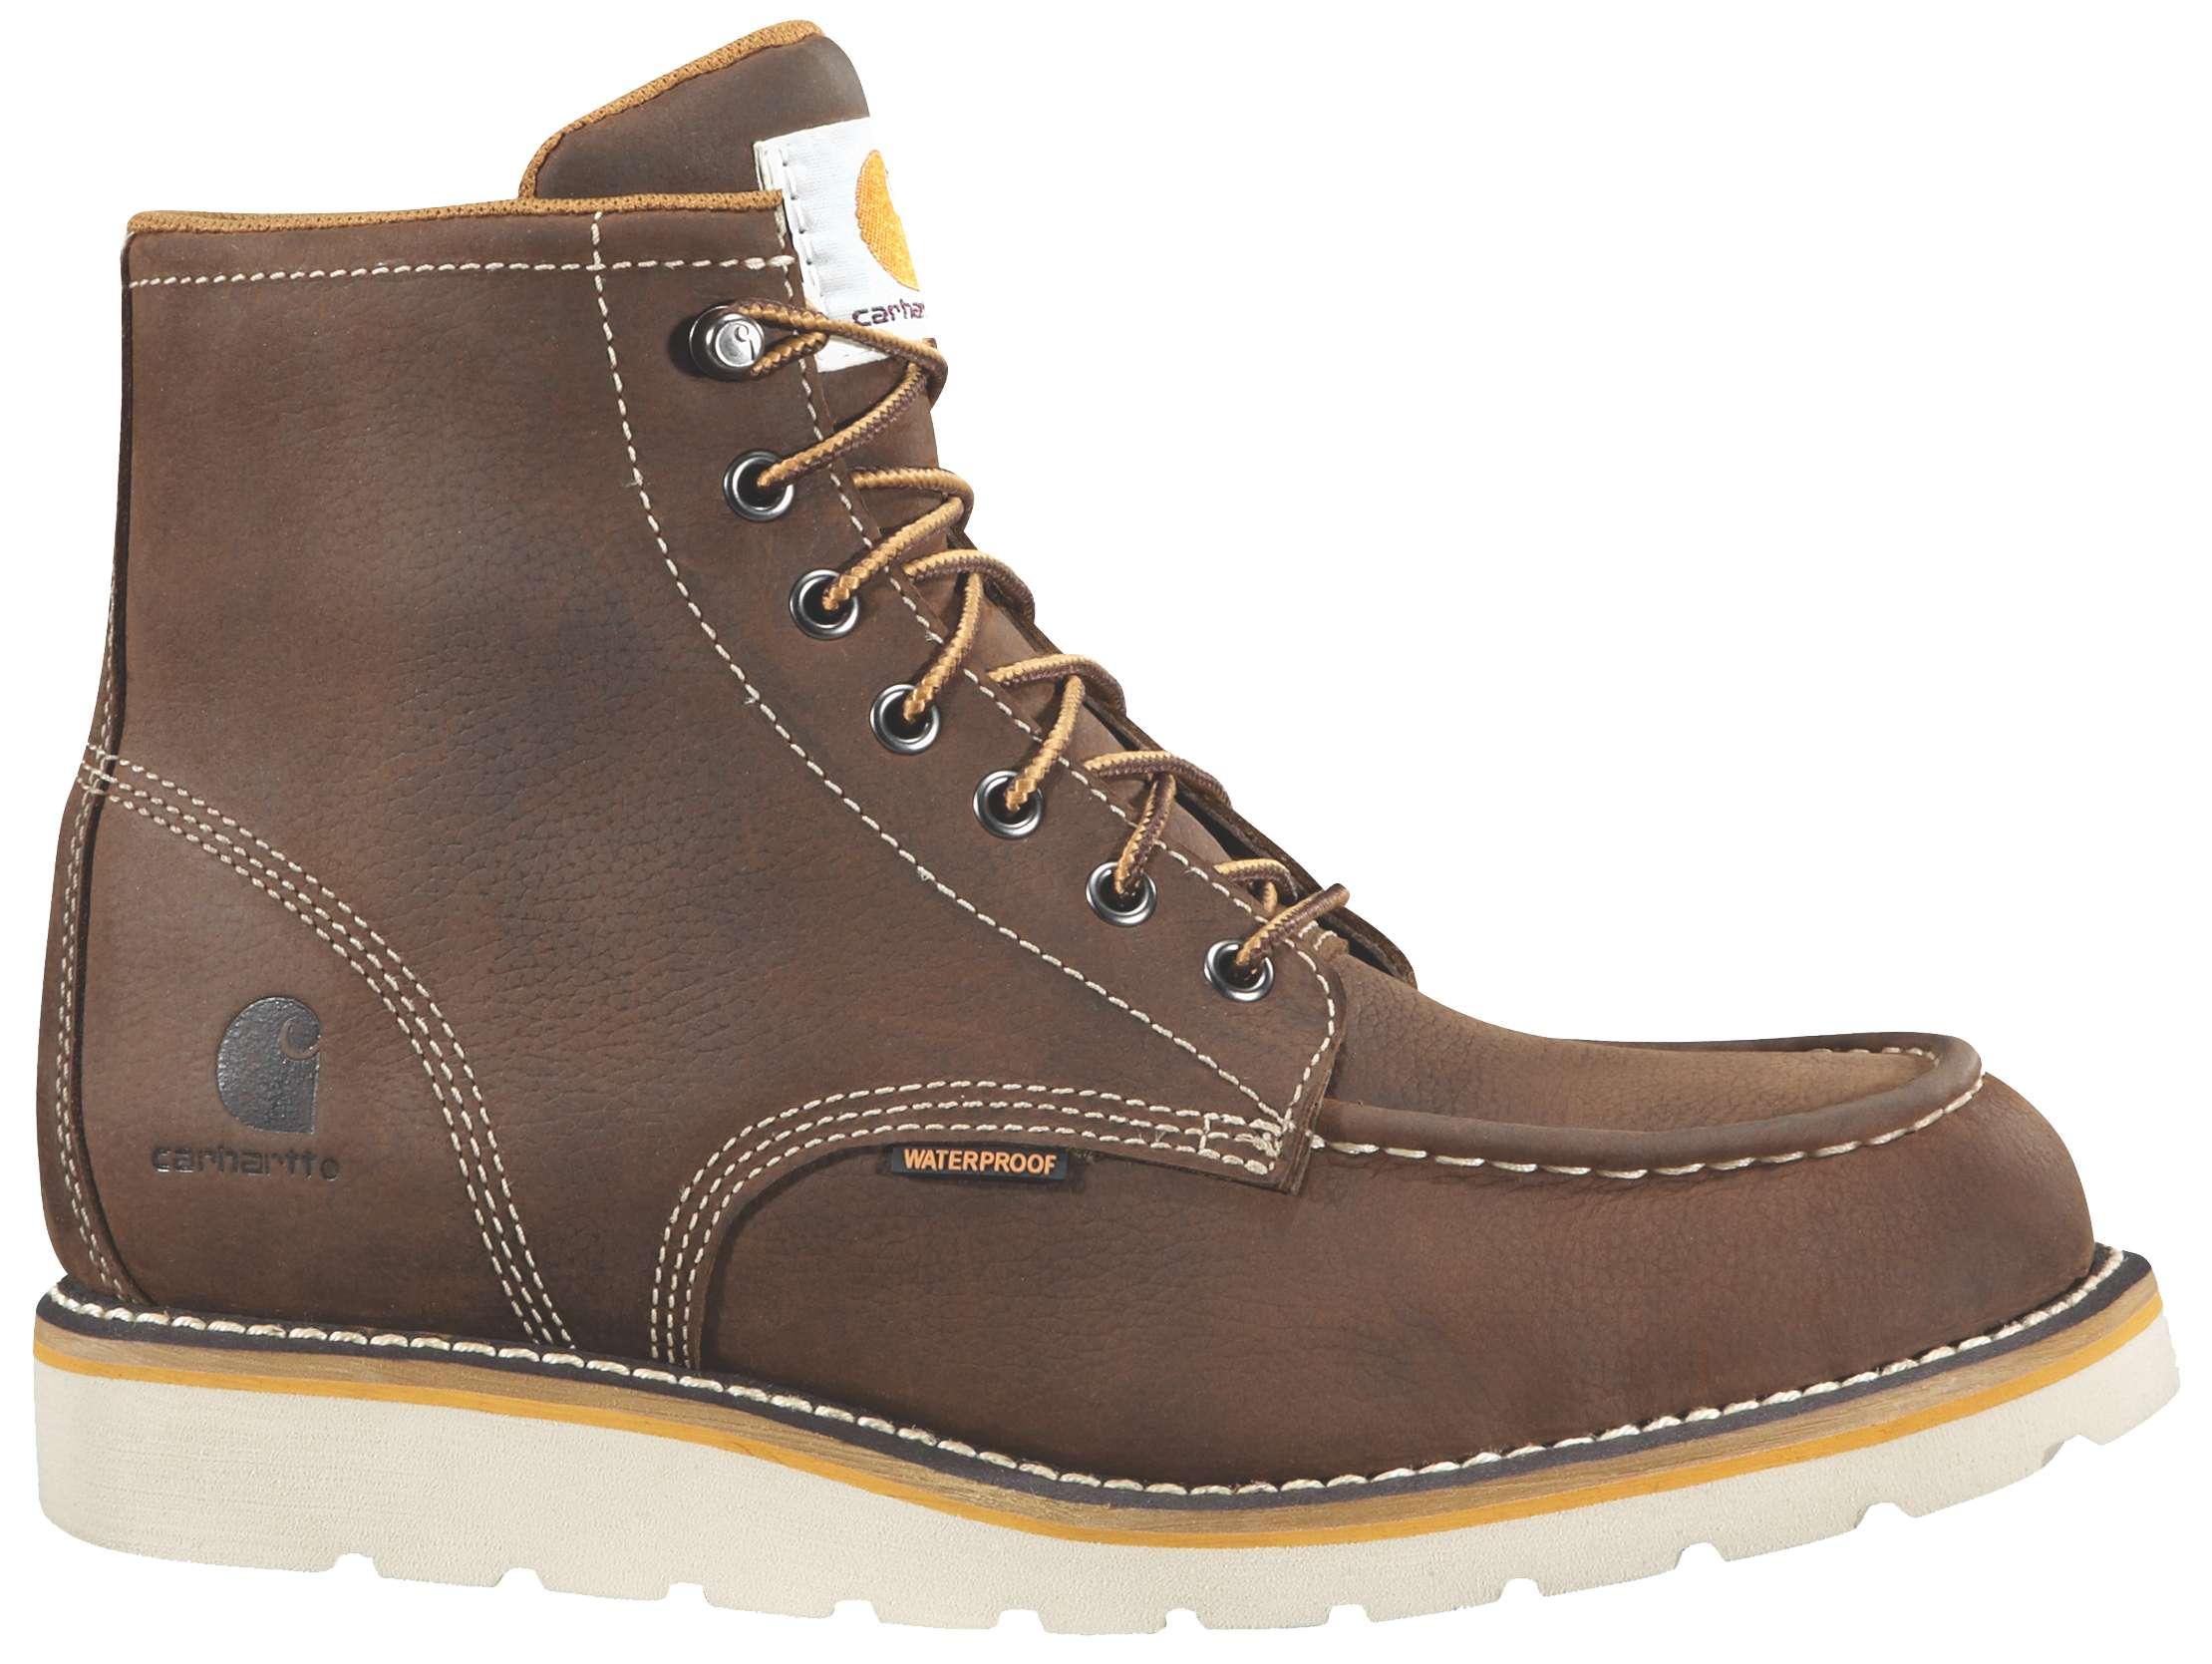 Carhartt 6-Inch Steel Toe Wedge Boot